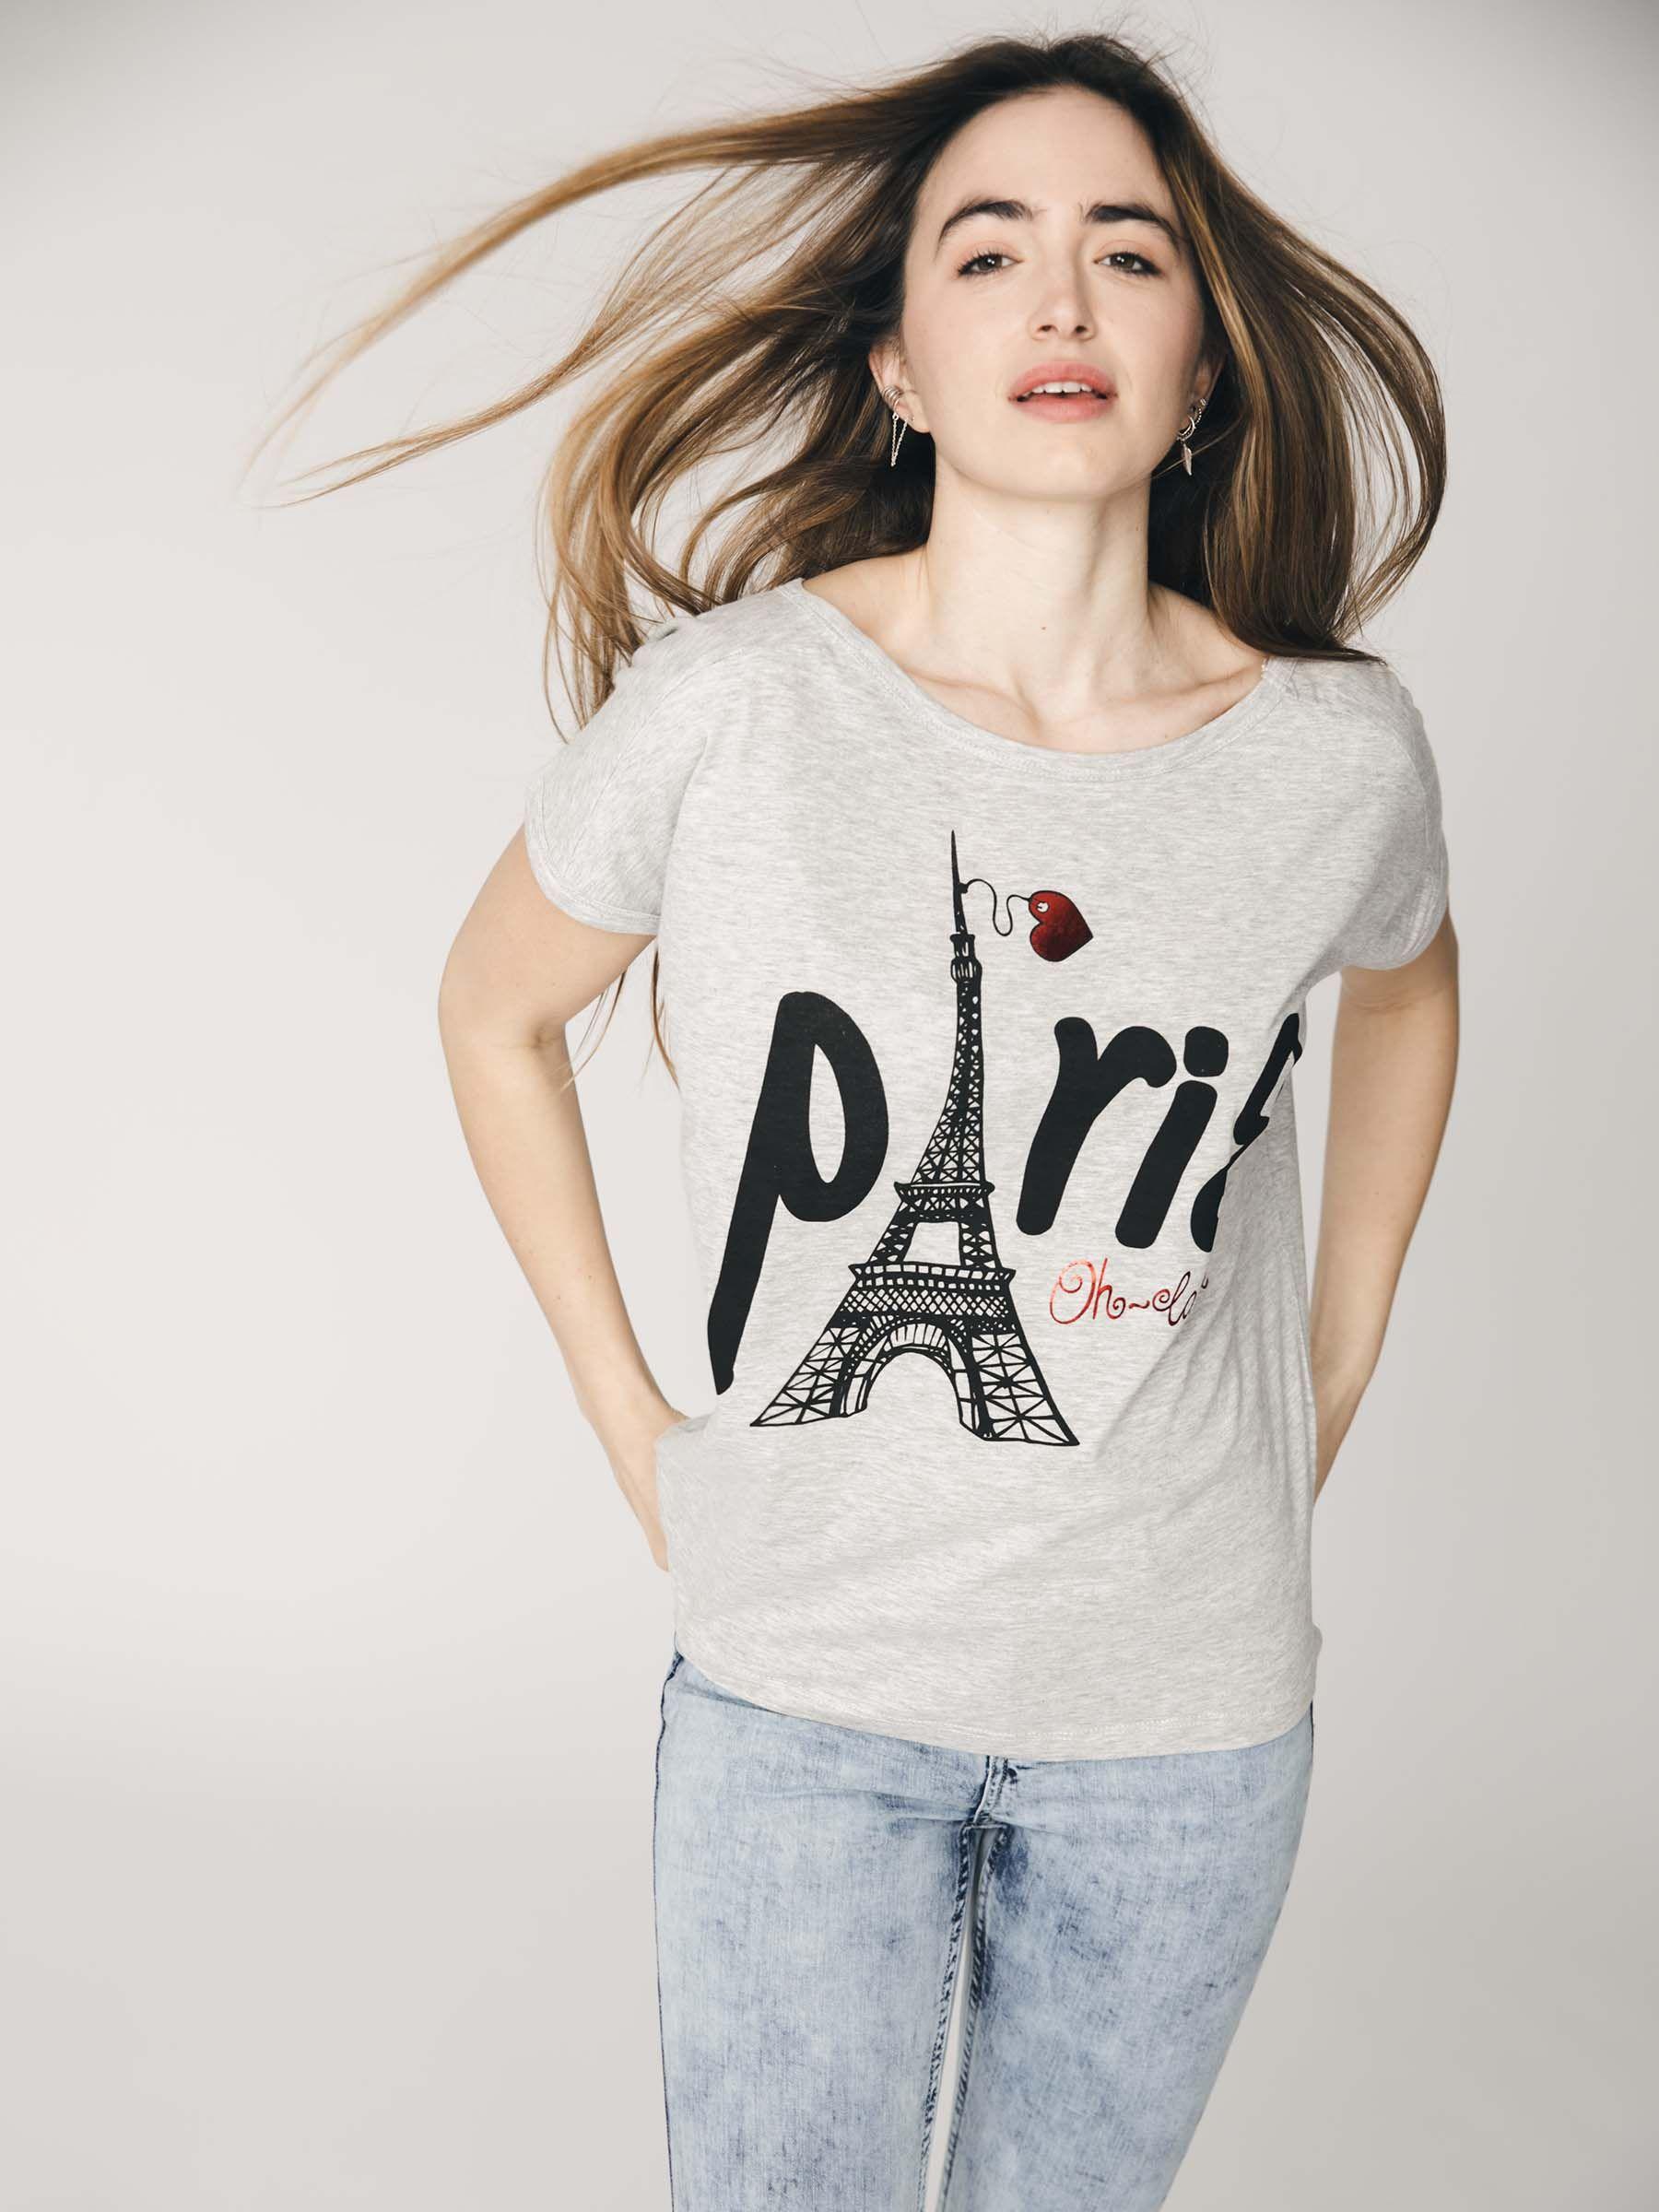 Inside Camiseta para Mujer